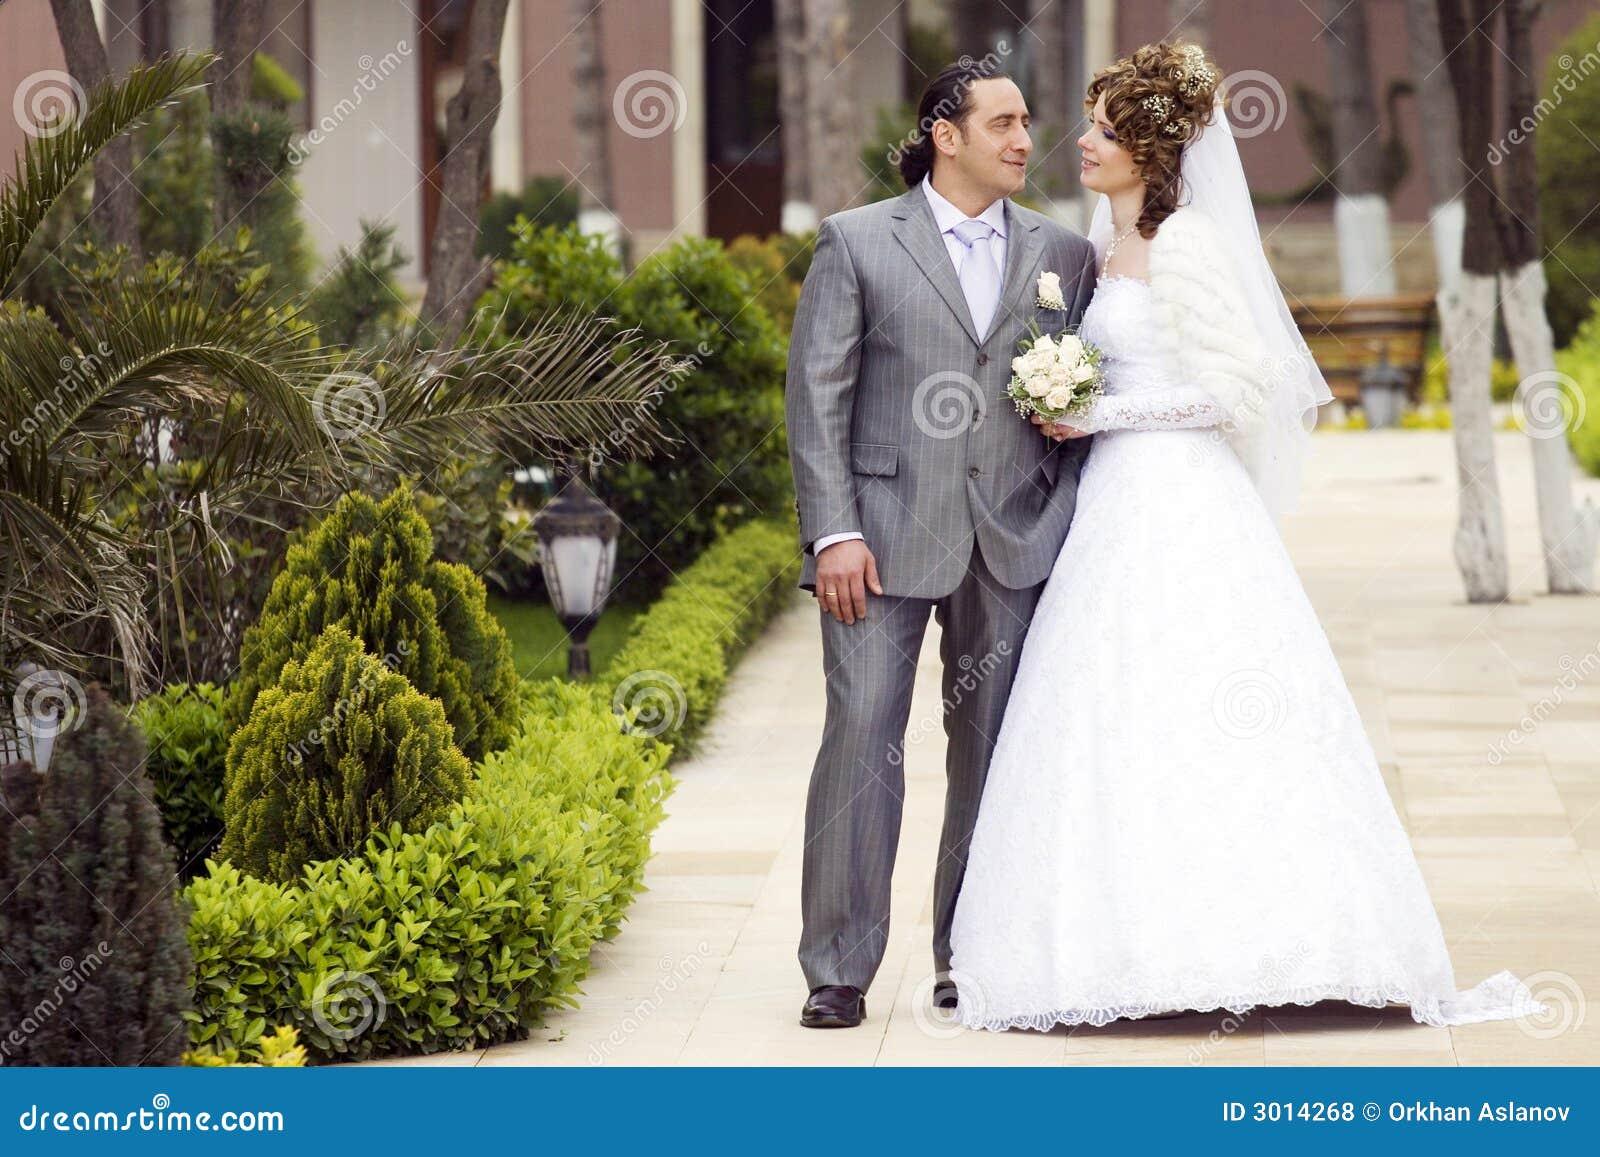 photo: Almost Bride Online